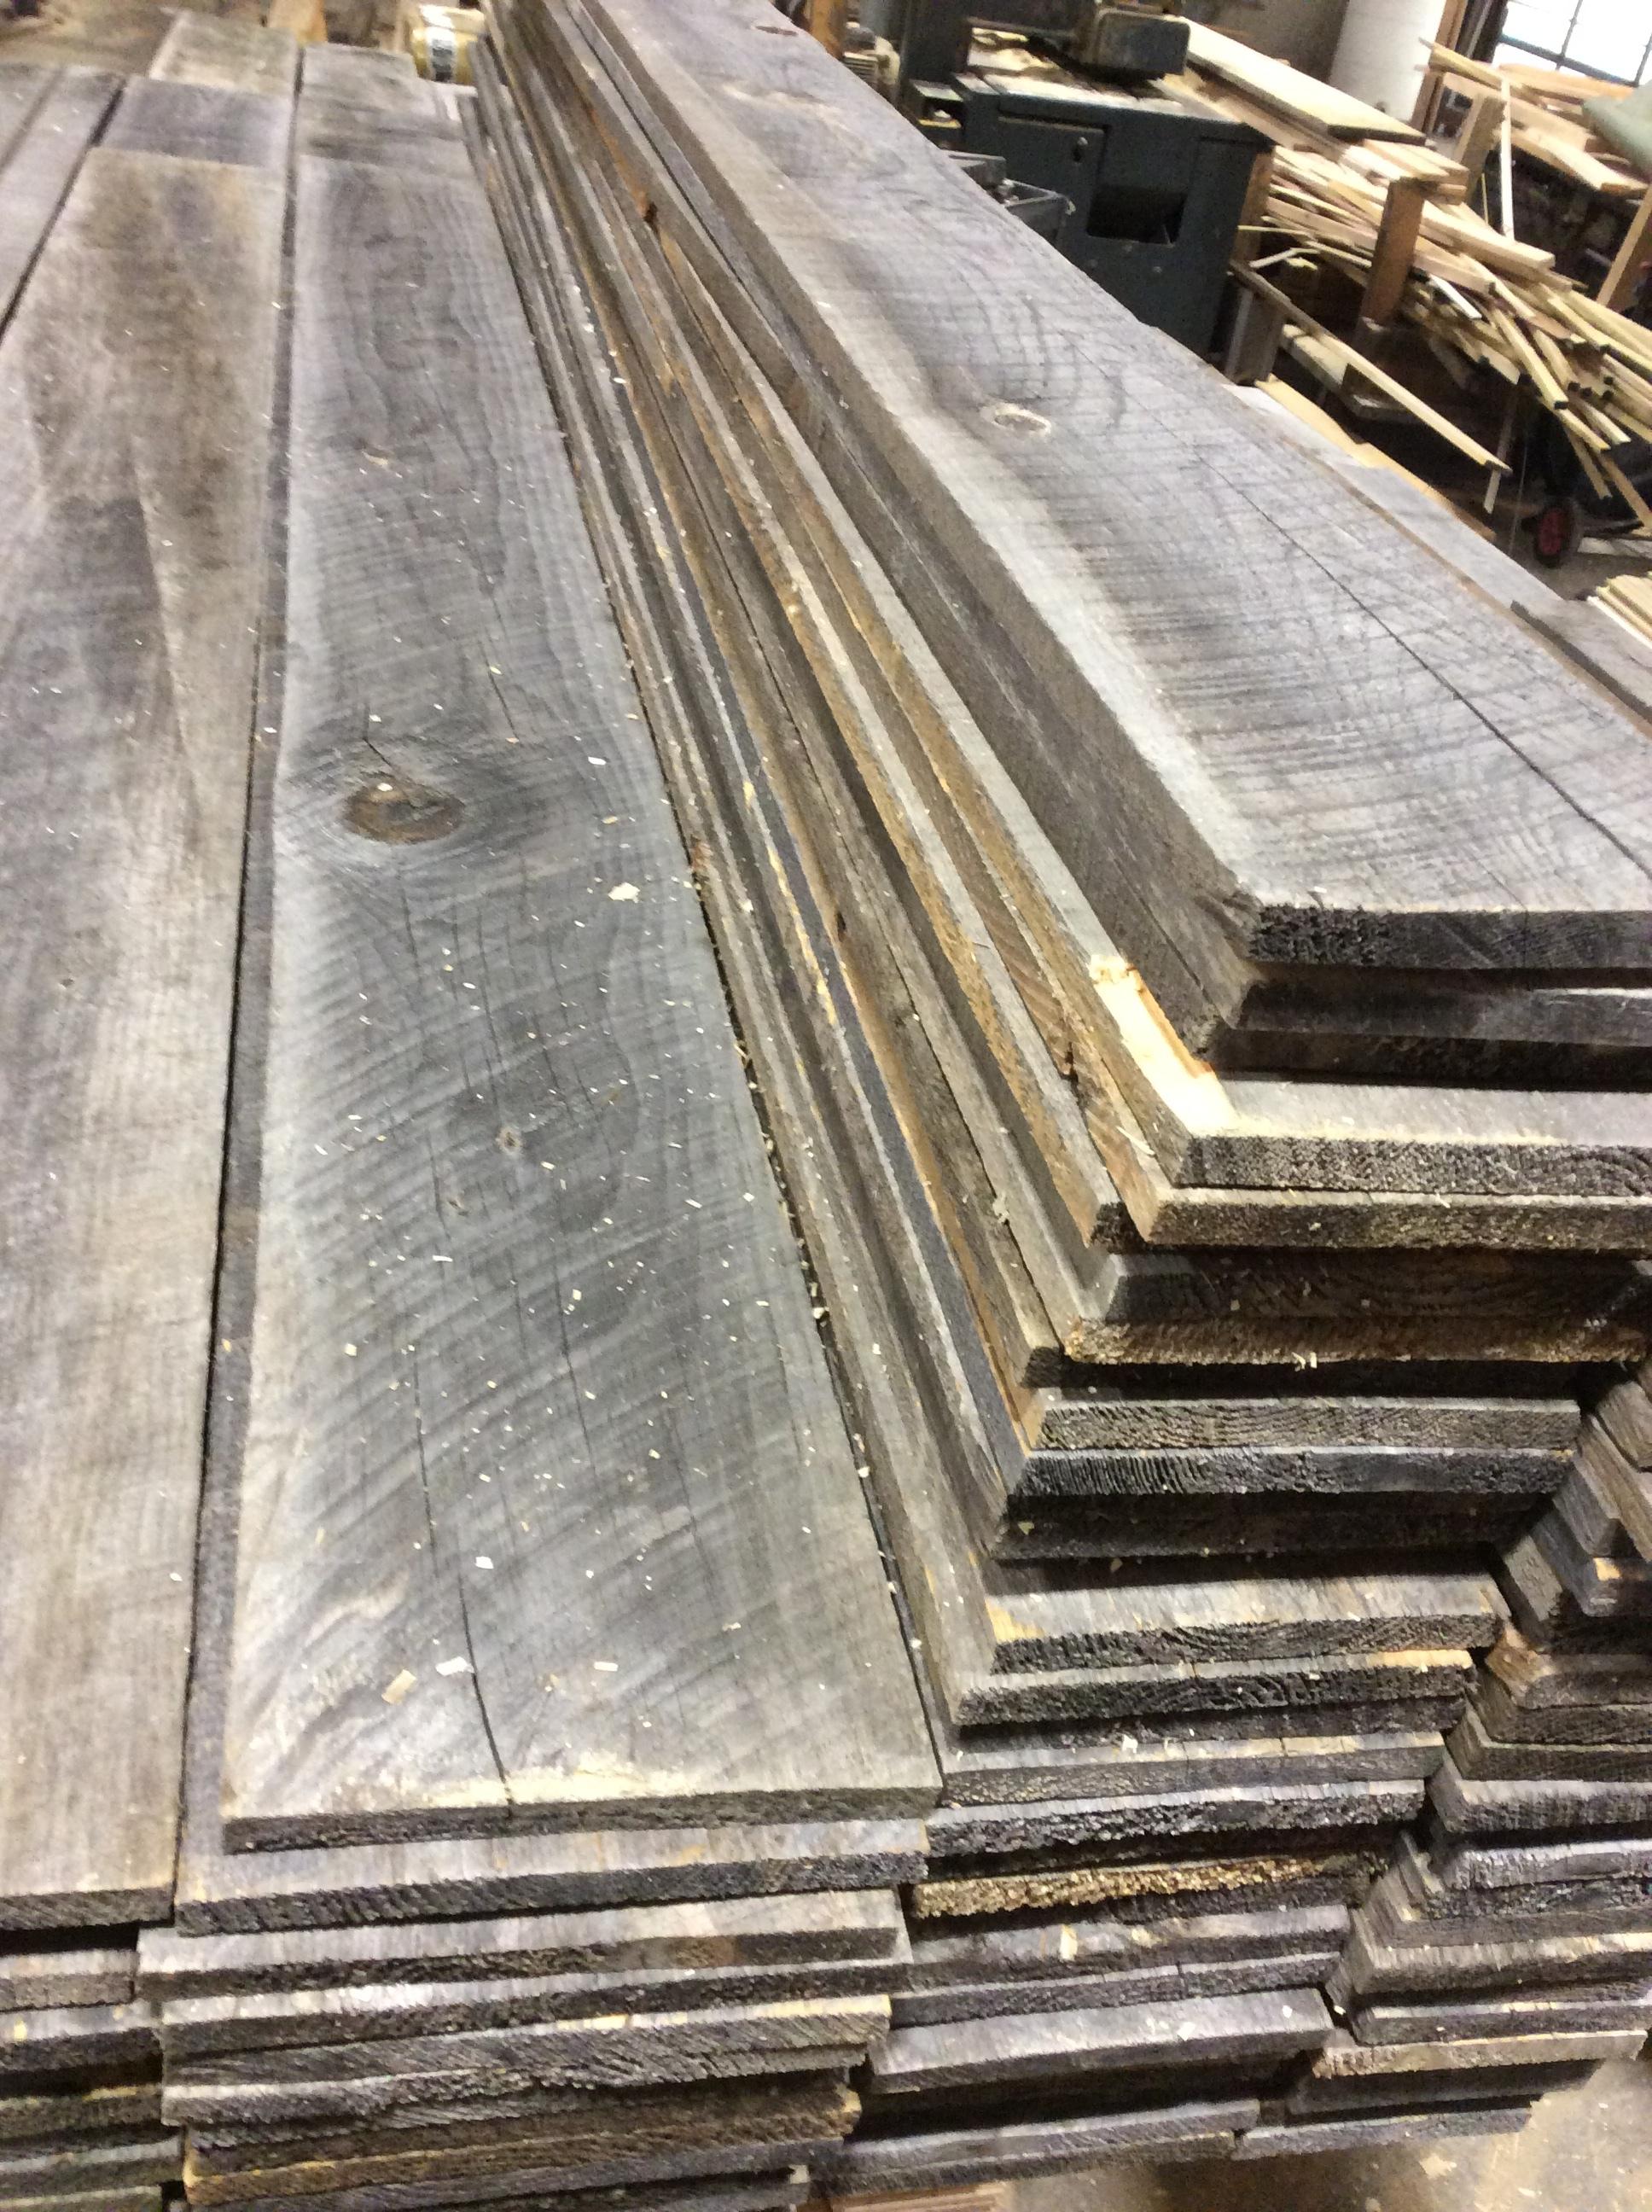 Barn Board Stock Pile